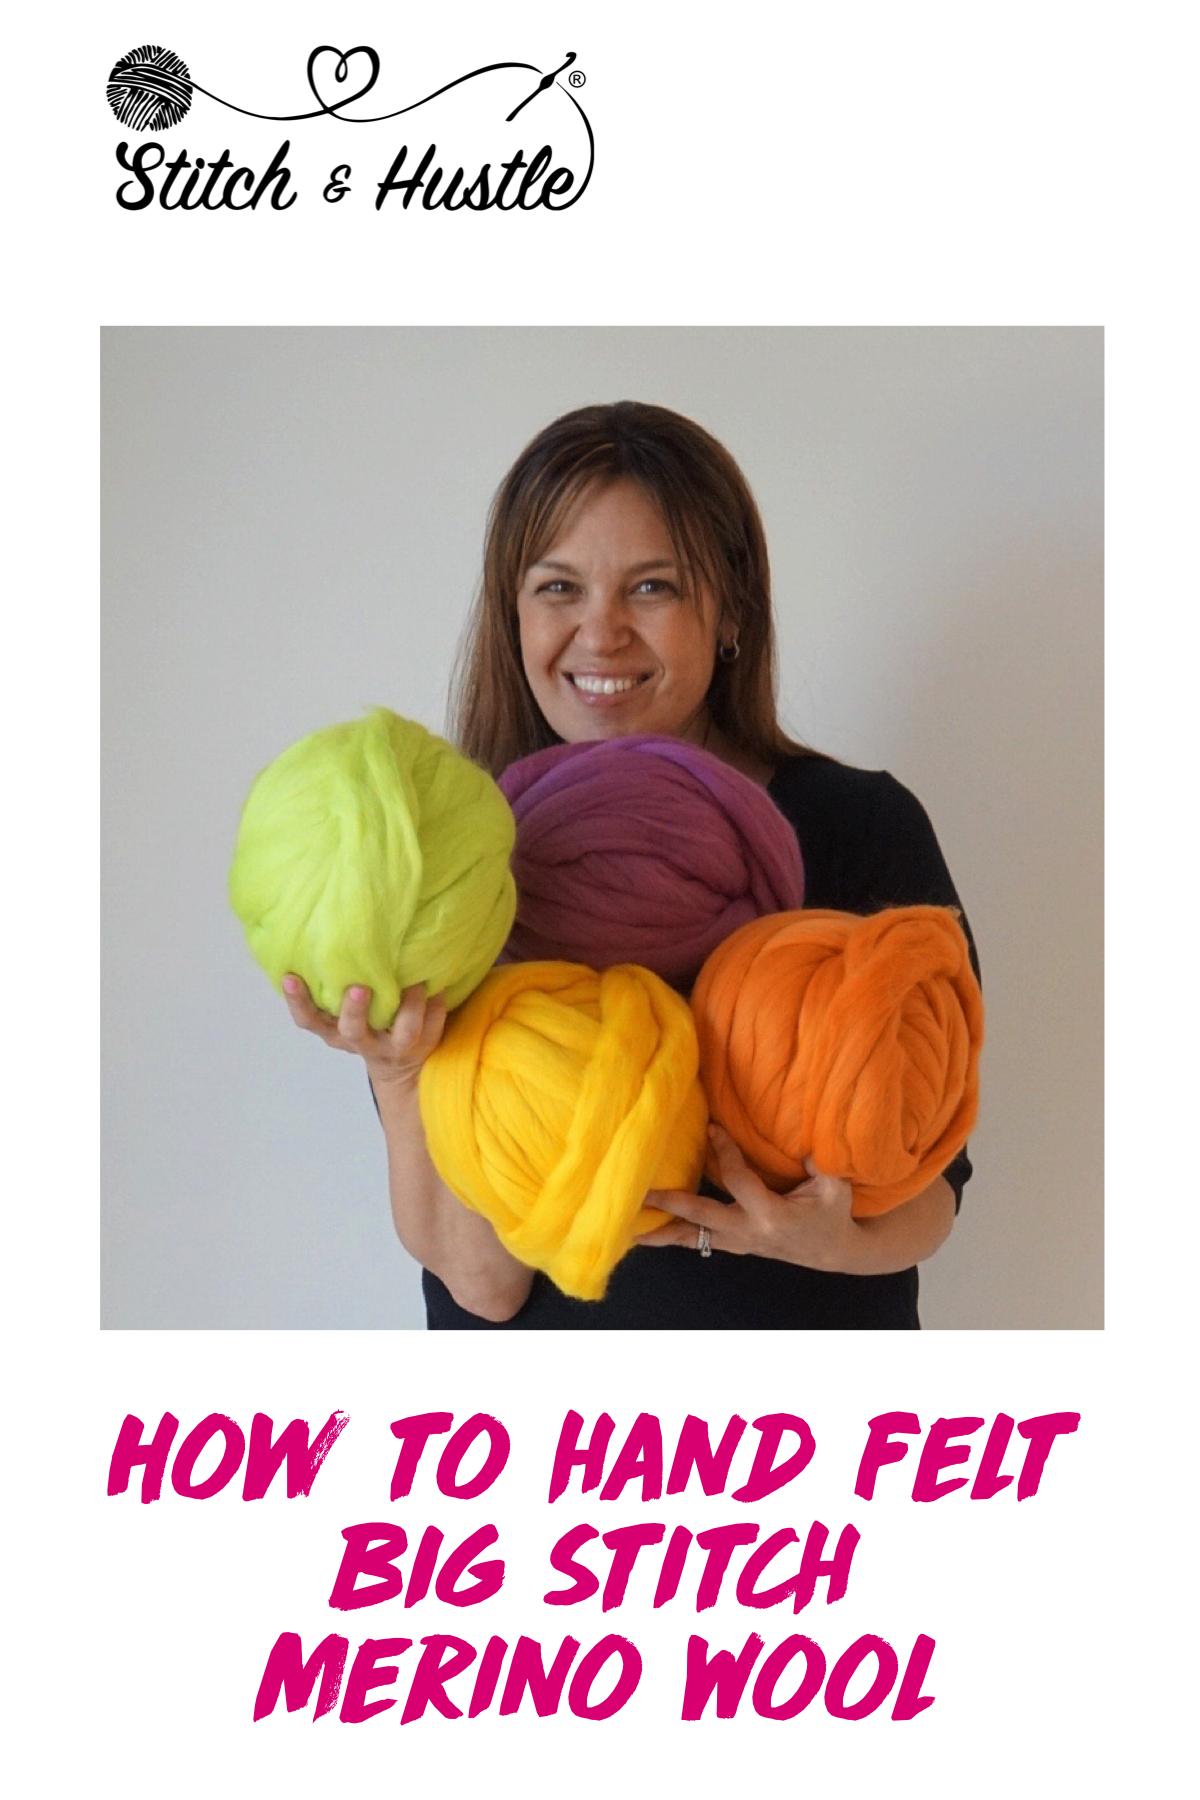 Stitch_And_Hustle_free-crochet-pattern-19.png